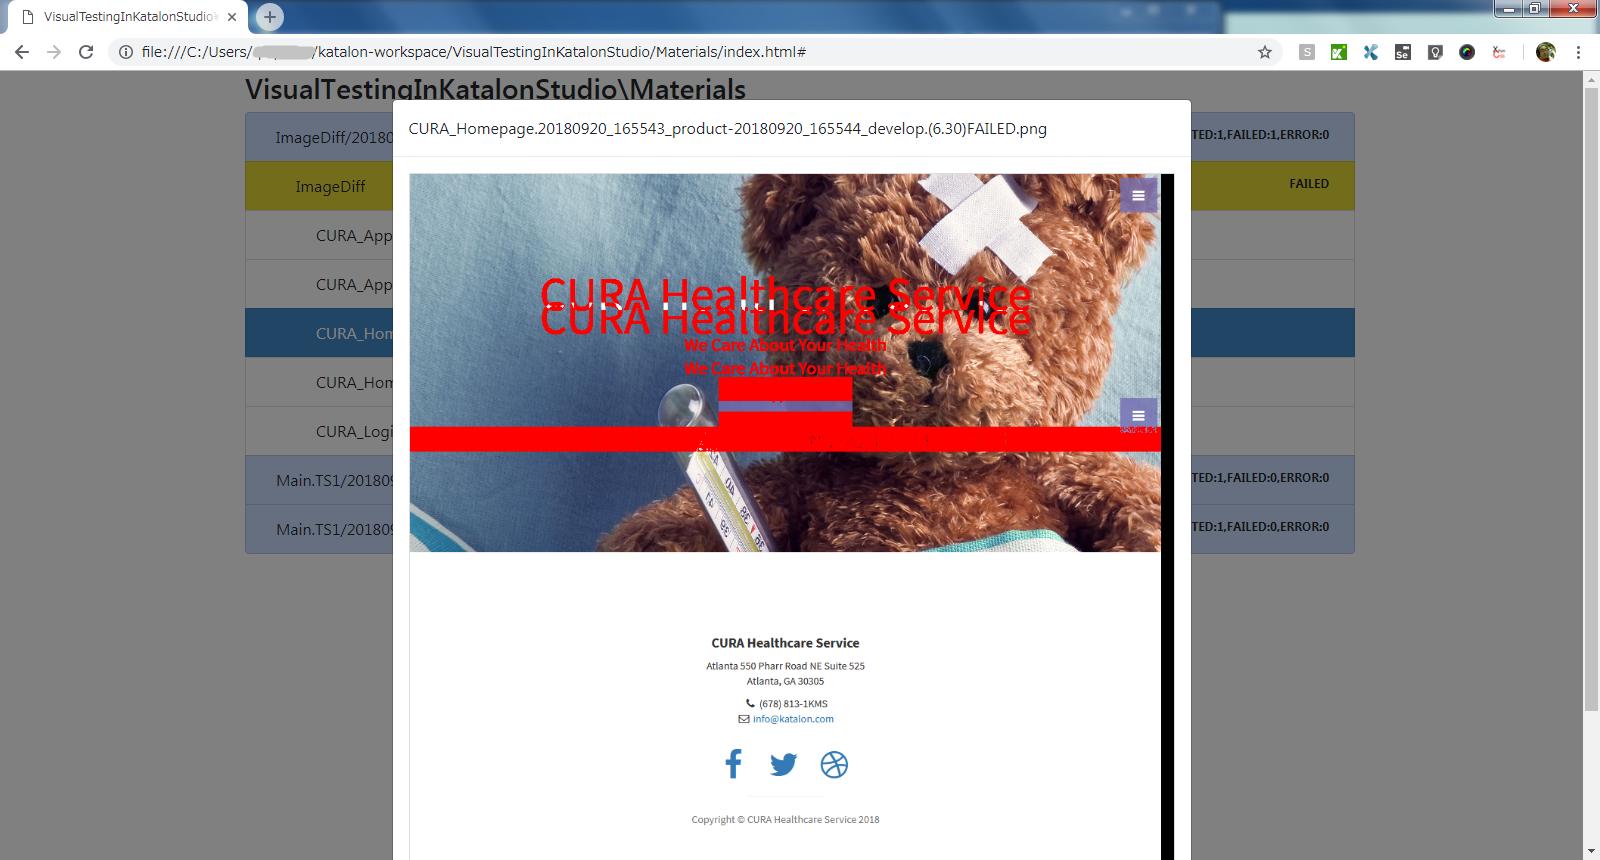 ImageDiff_CURA_Homepage.png